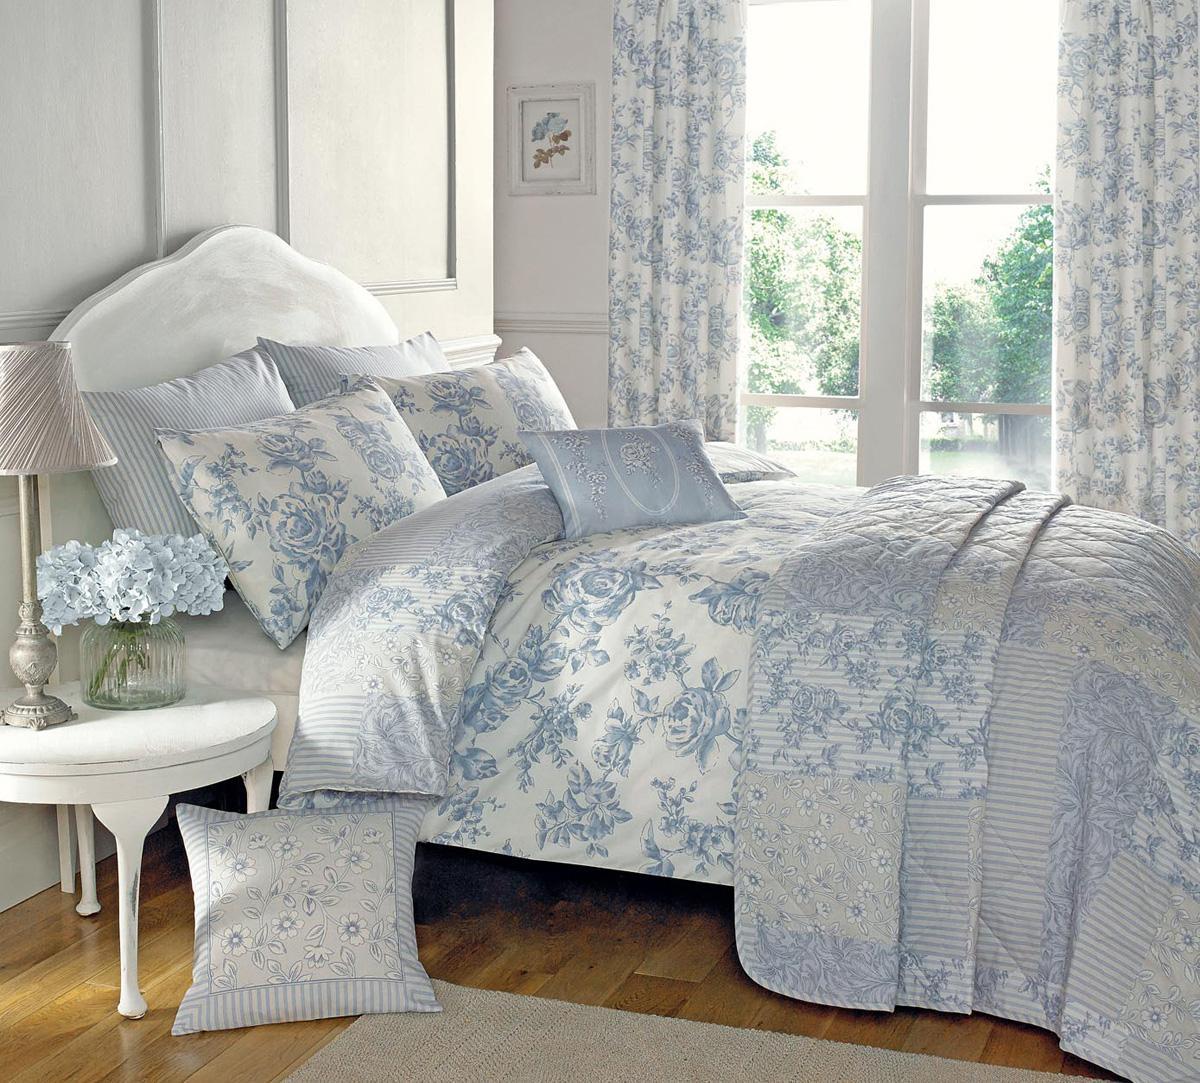 malton bedding set. malton bedding set in blue  free uk delivery  terrys fabrics